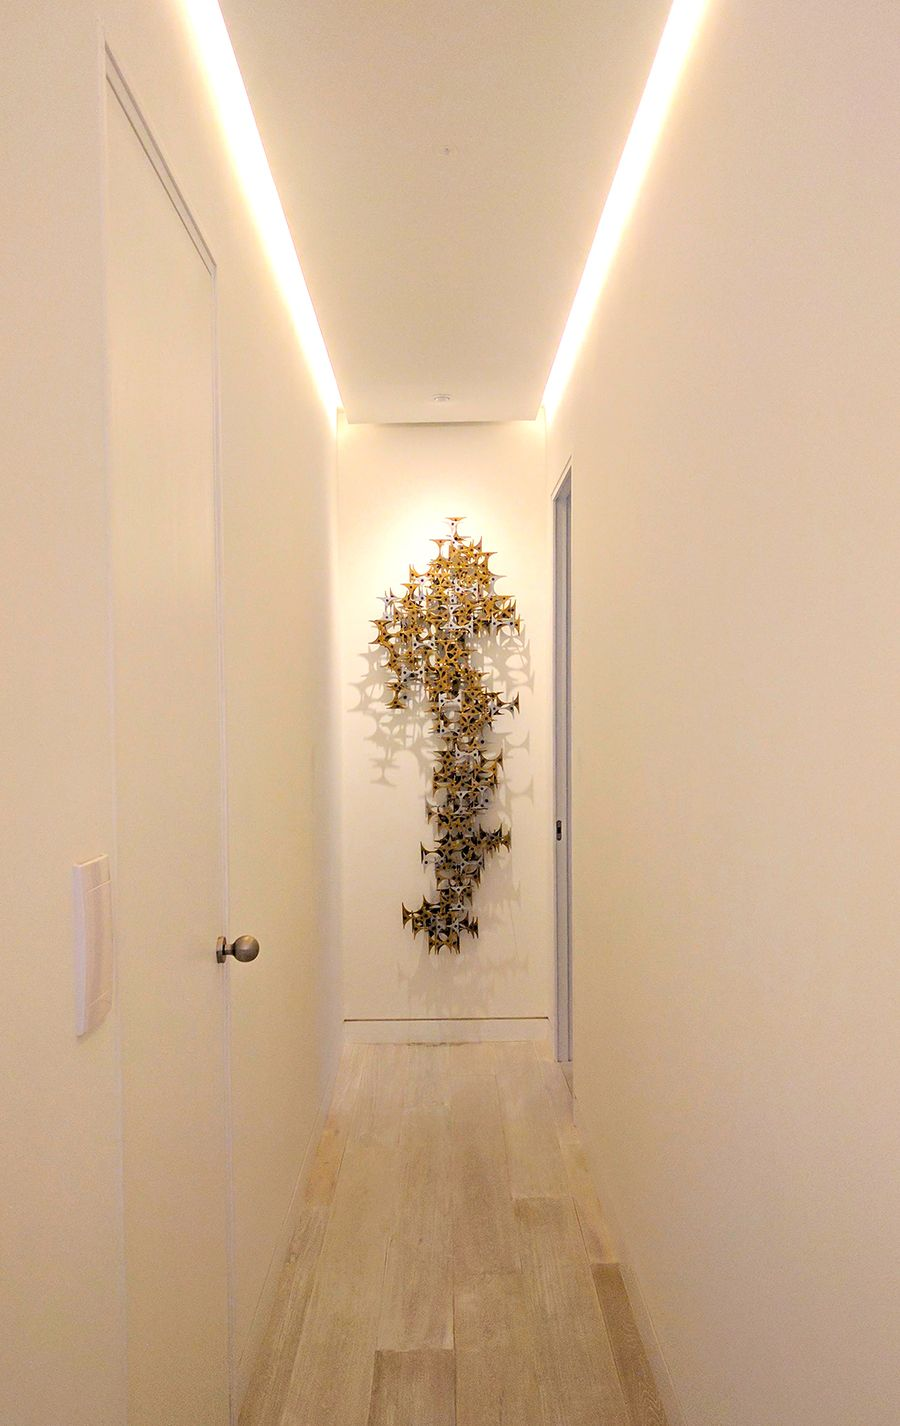 Pasillo con iluminaci n indirecta mediante tira de led oculta en la fosa del techo escultura - Iluminacion indirecta led ...